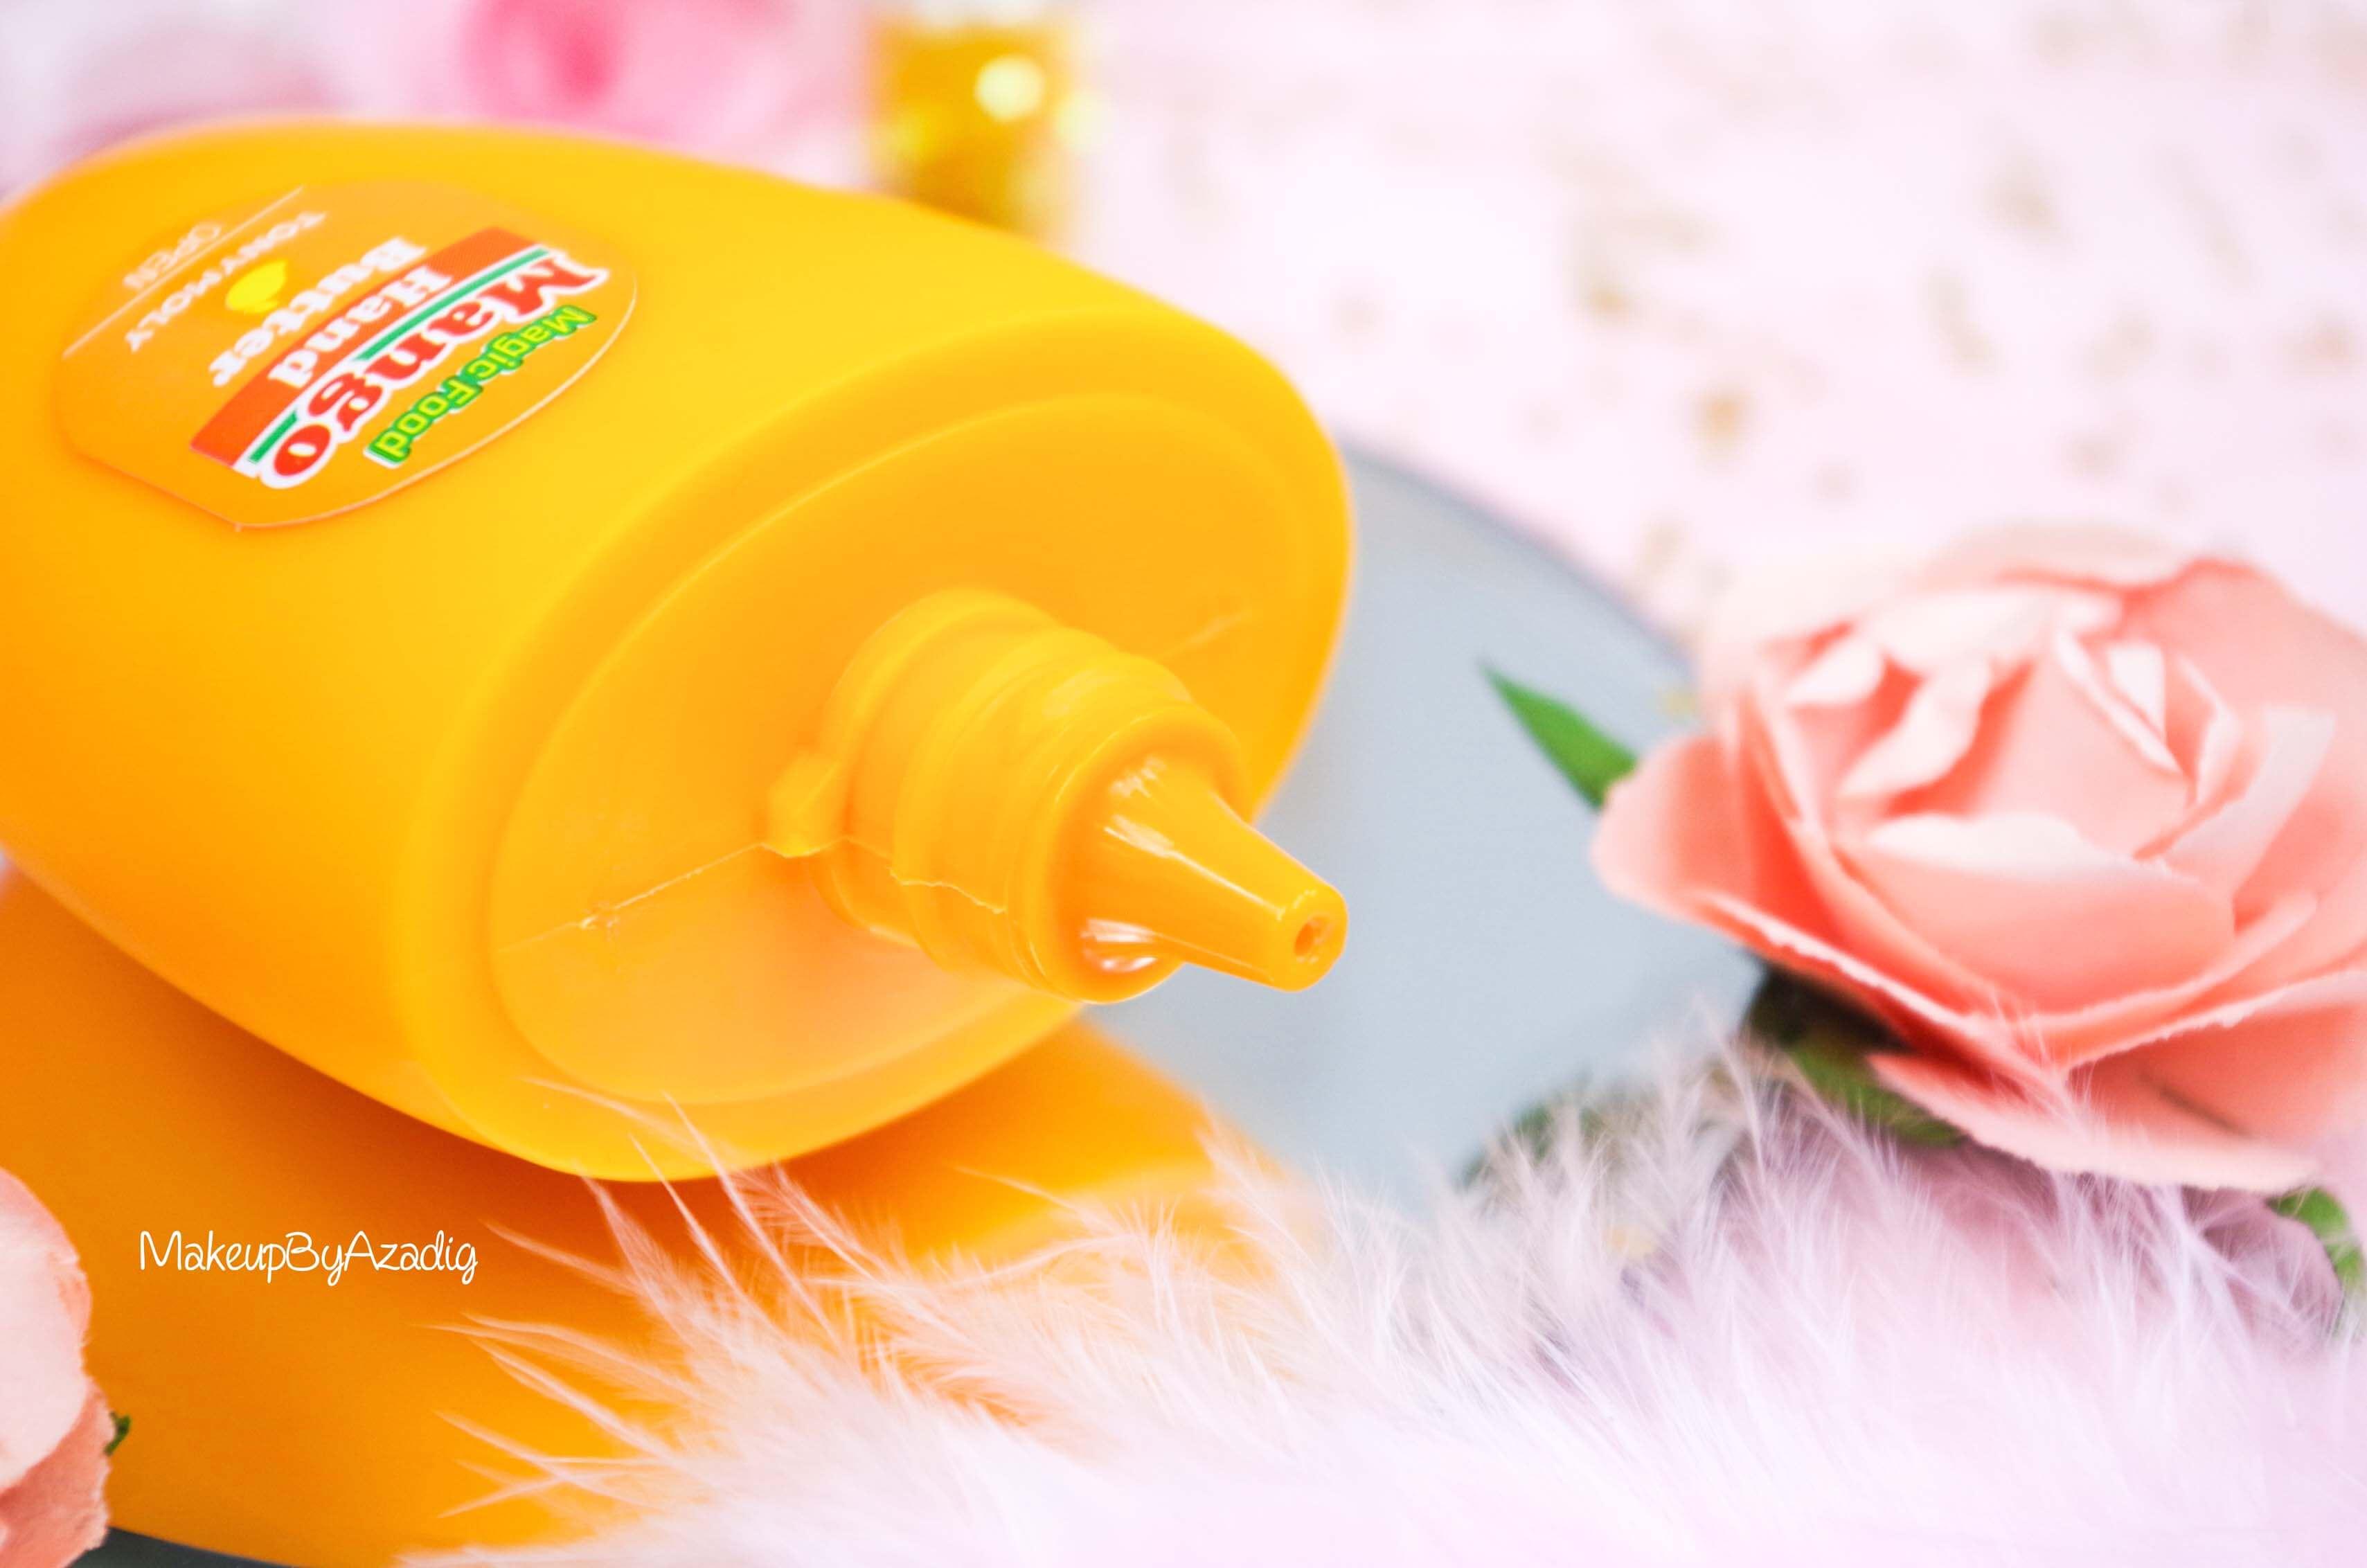 creme-mains-mango-hand-butter-tonymoly-sephora-france-cocooning-revue-avis-prix-makeupbyazadig-influencer-embout